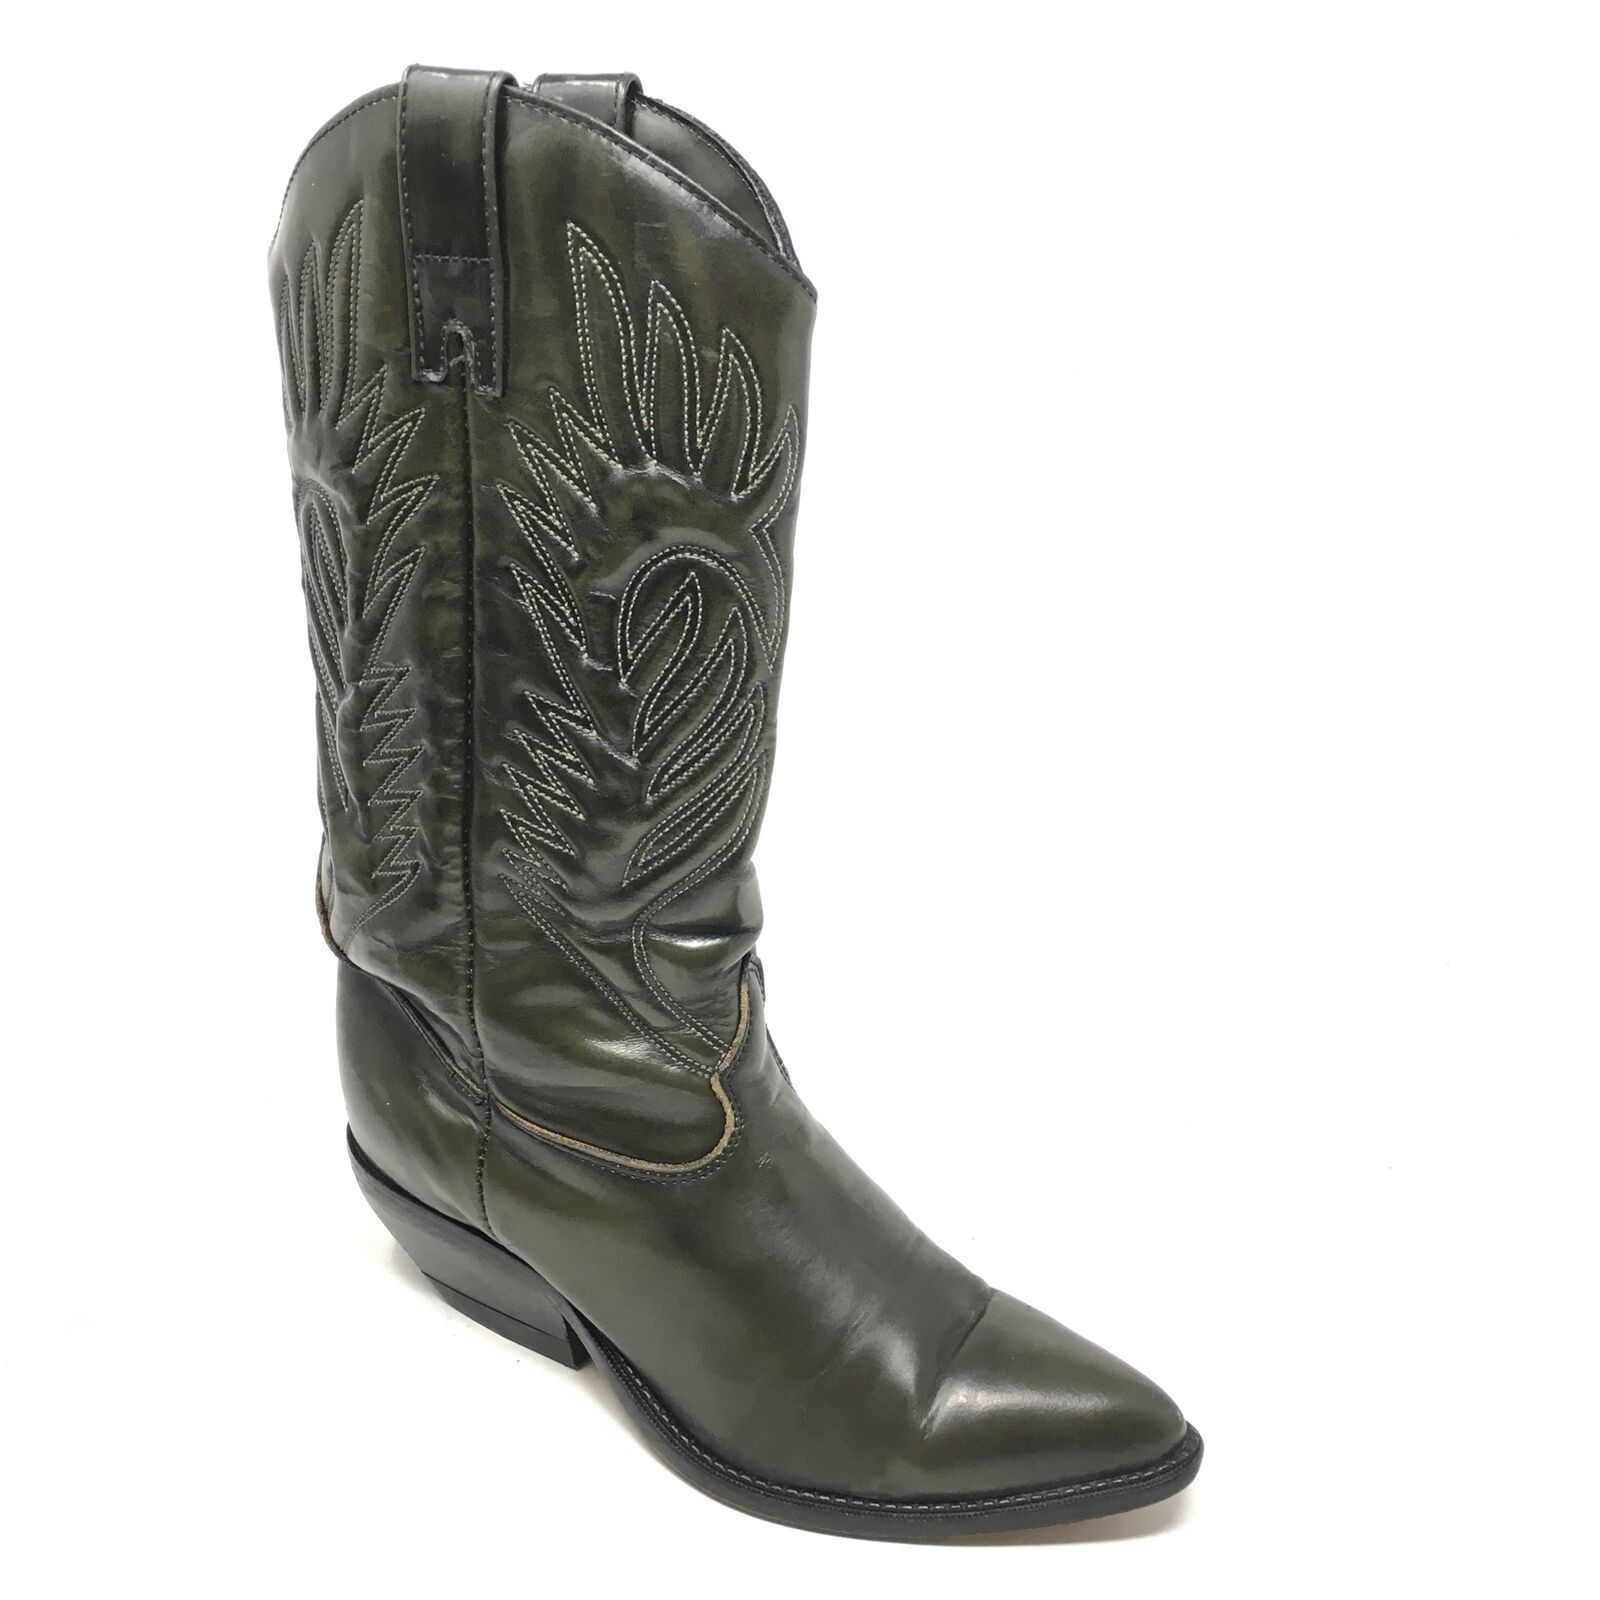 Women's VINTAGE Zodiac USA Western Boots Cowboy shoes Size 7M Green Leather W6